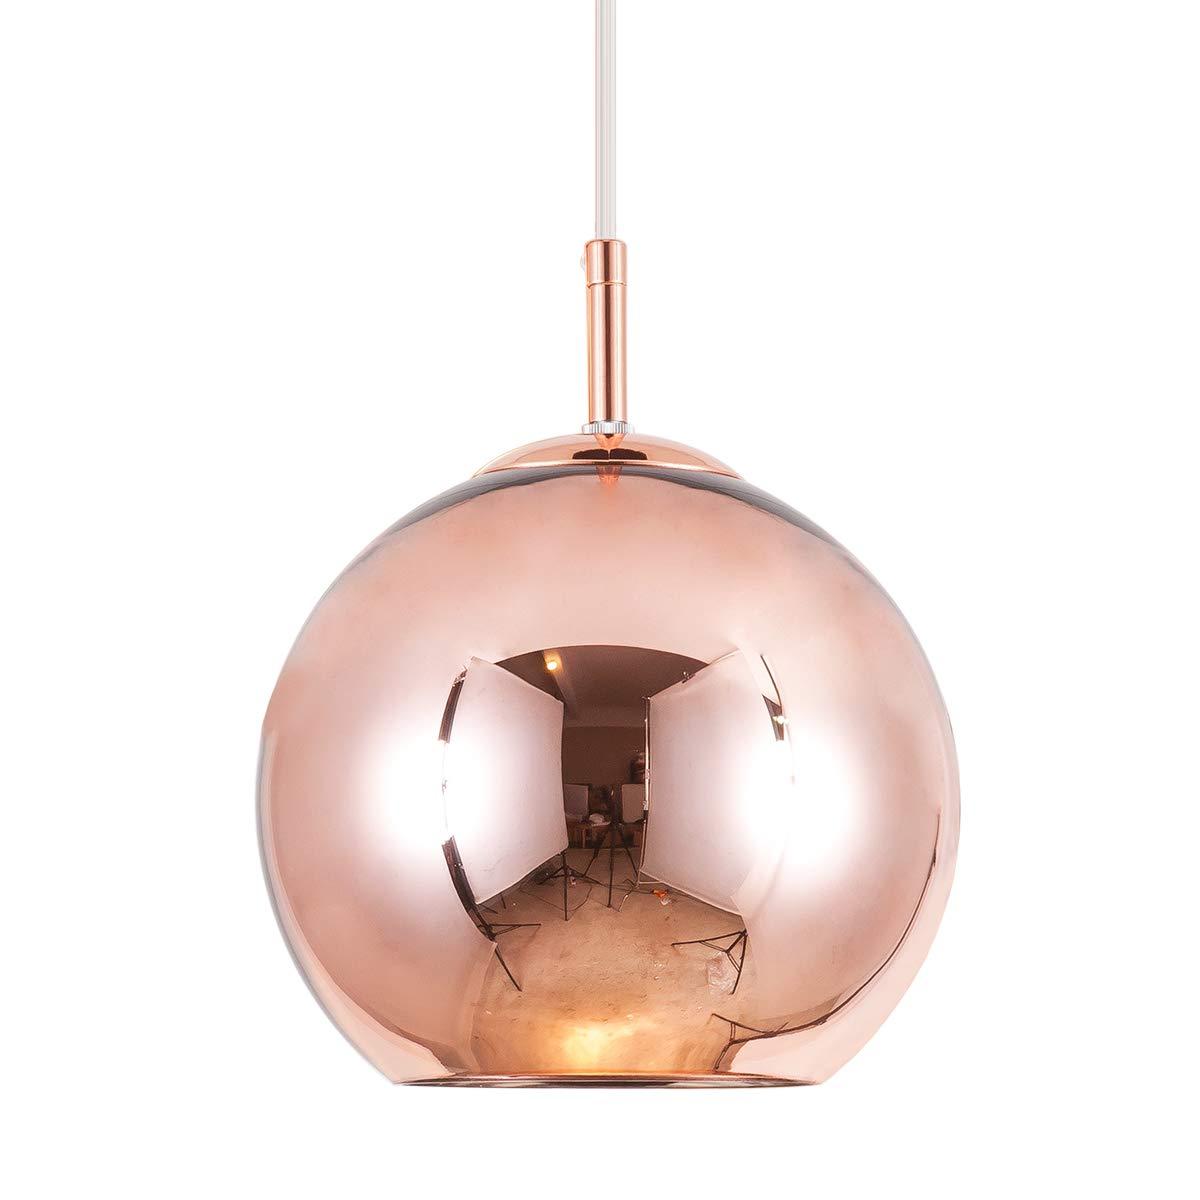 Amazoncom Mzithern Modern Mini Globe Pendant Lighting With